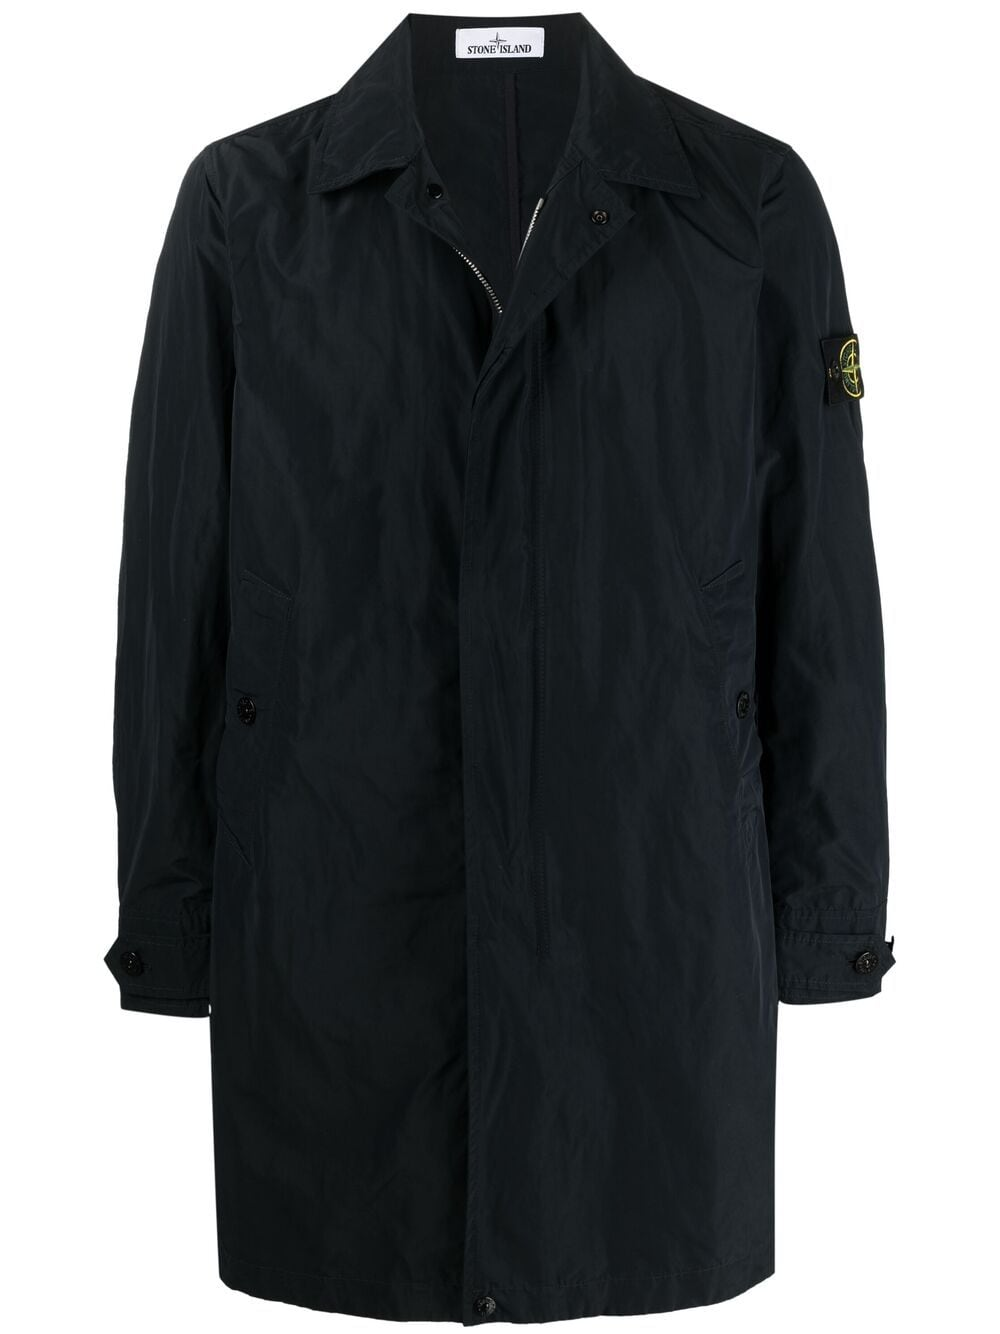 <p class='small-title'>STONE ISLAND</p>Jacket